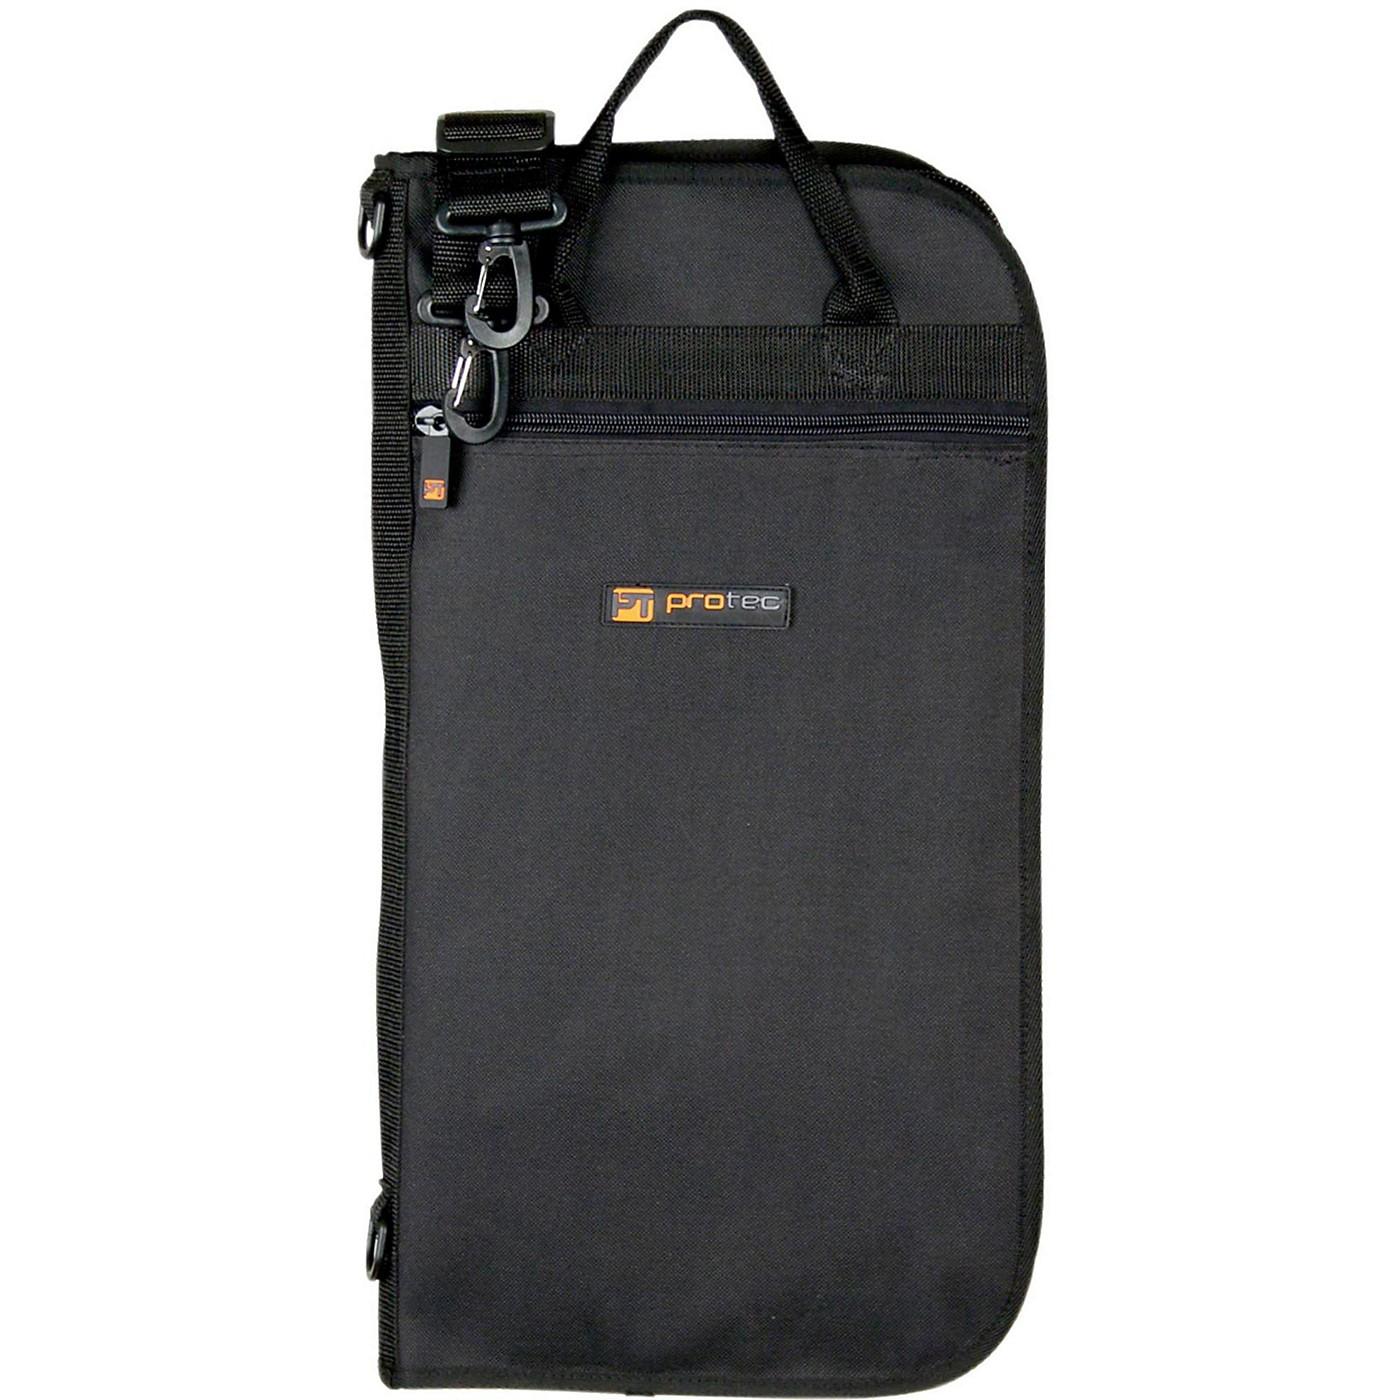 Protec Model C340 Drum Stick/Mallet Bag (Fits 20 Pairs) thumbnail